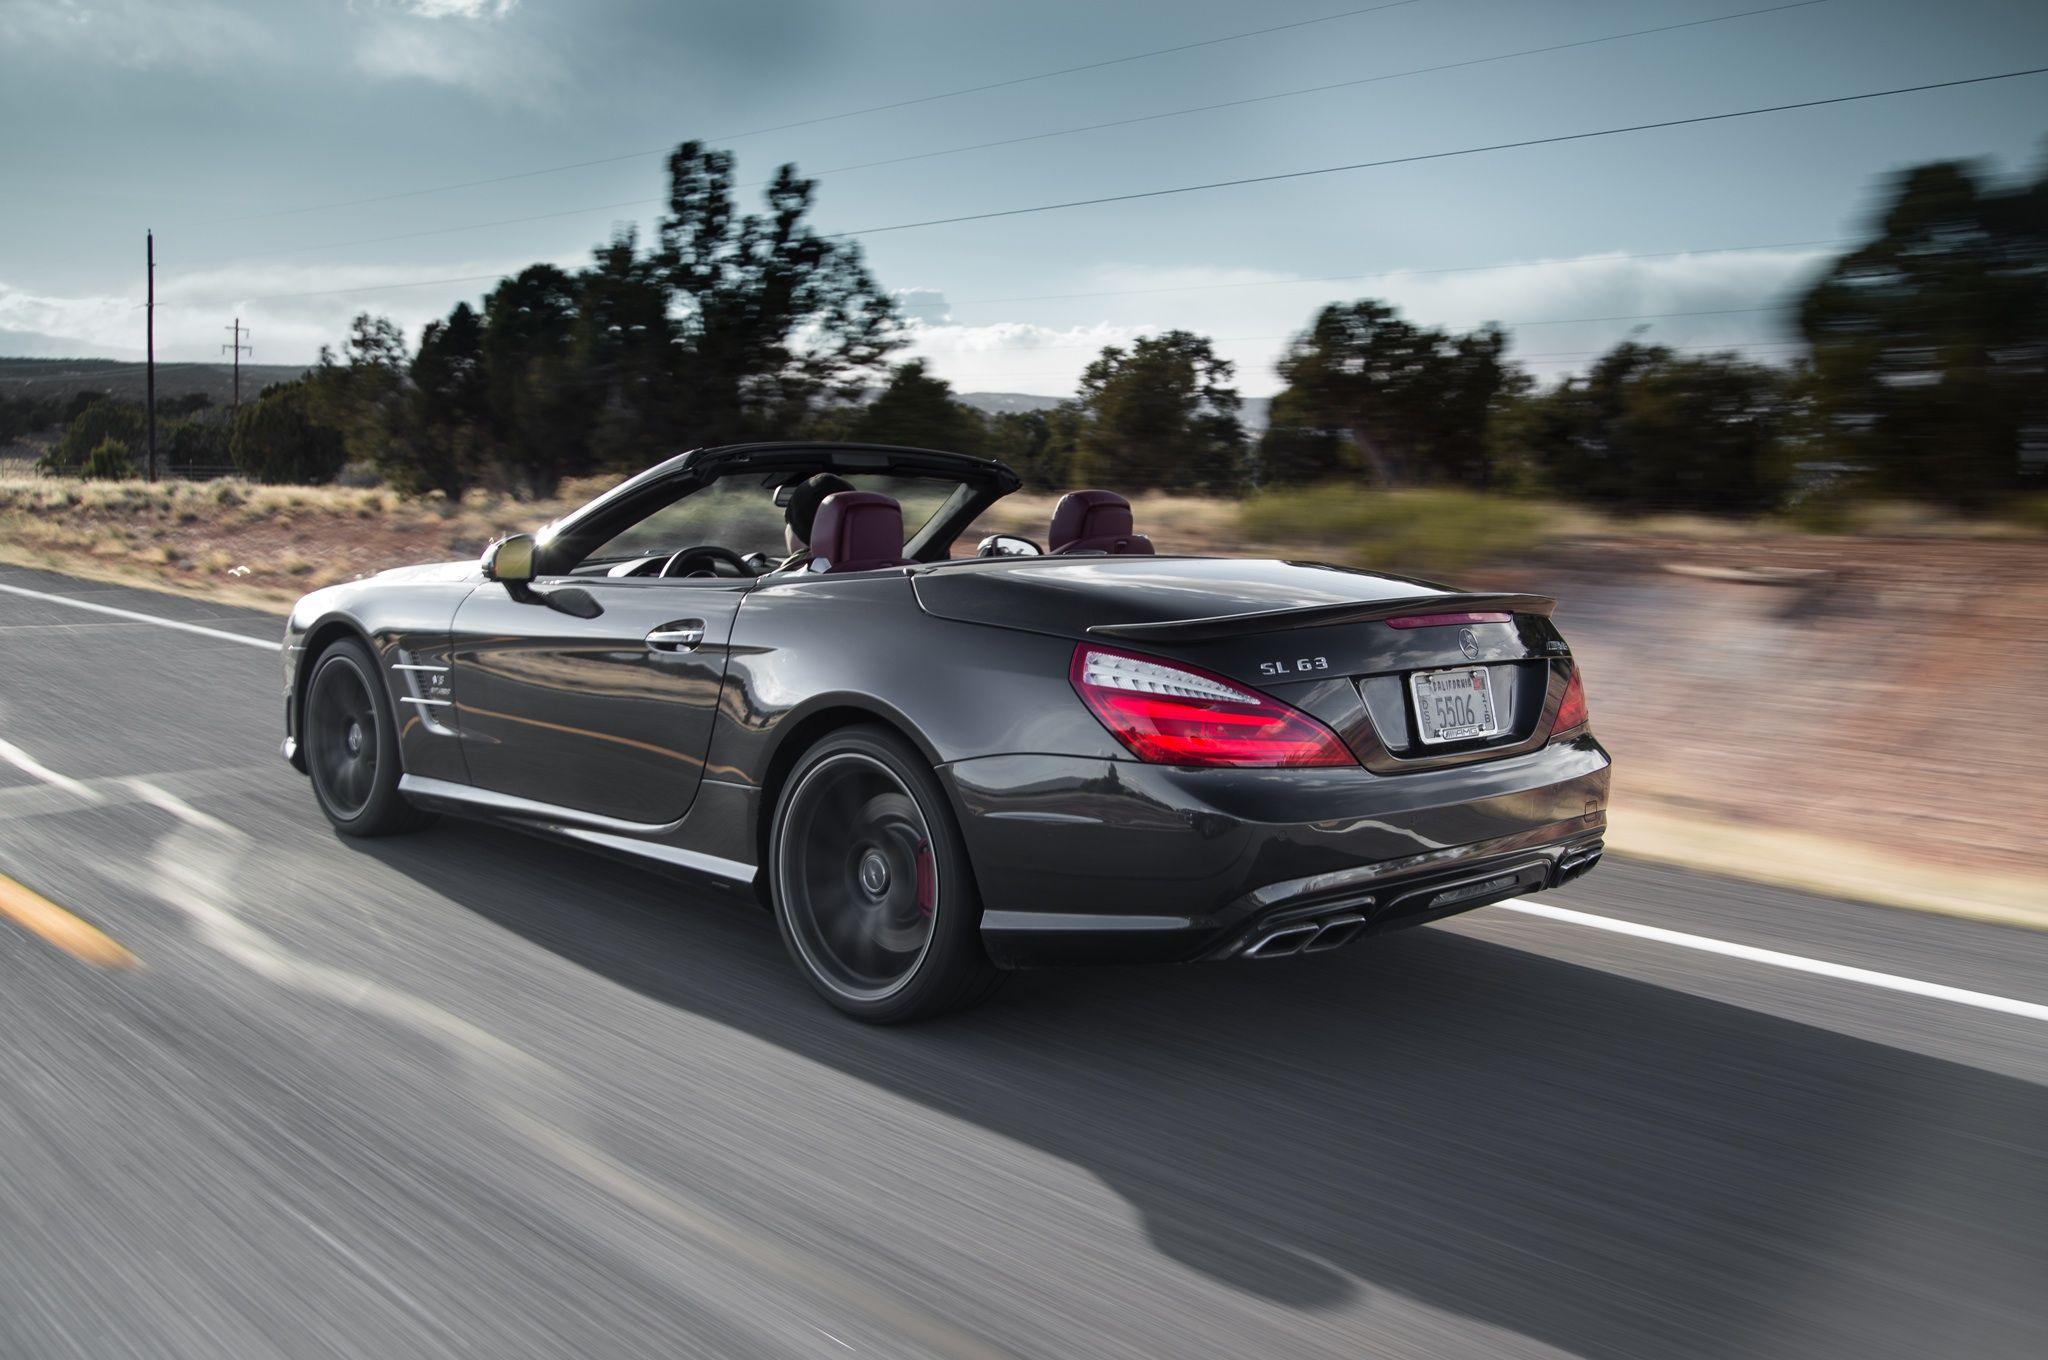 2017 Mercedes-benz Sl63 Amg Price Msrp Mercedes Benz Sl65 Amg 2017 Exotic  Car Wallpapers 02 Of 22 Diesel